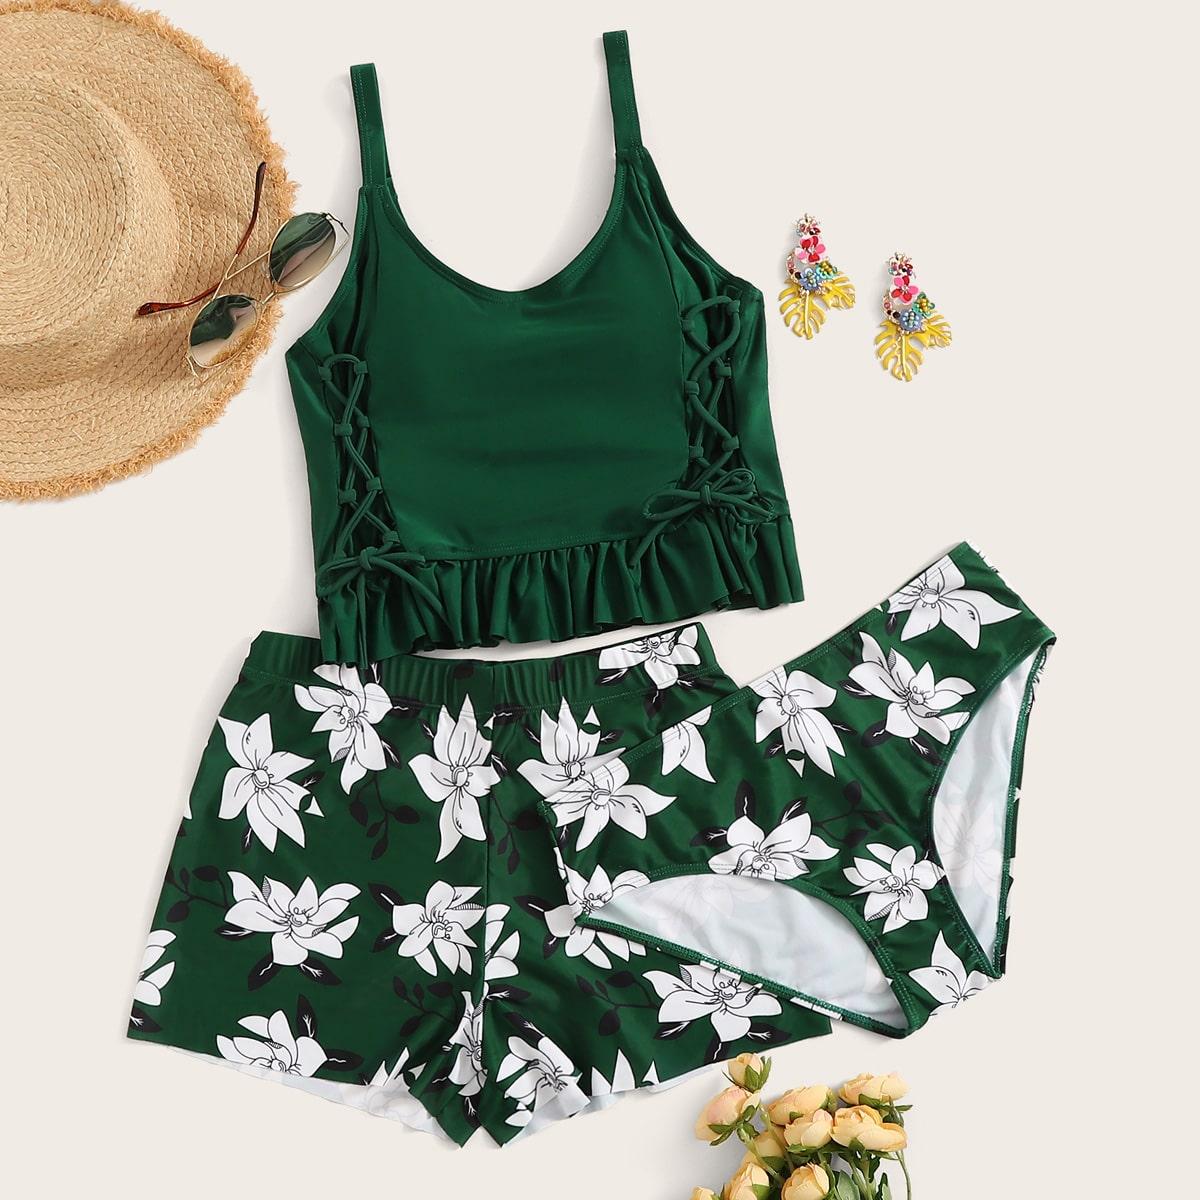 SHEIN coupon: 3pack Floral Ruffle Hem Bikini Swimsuit